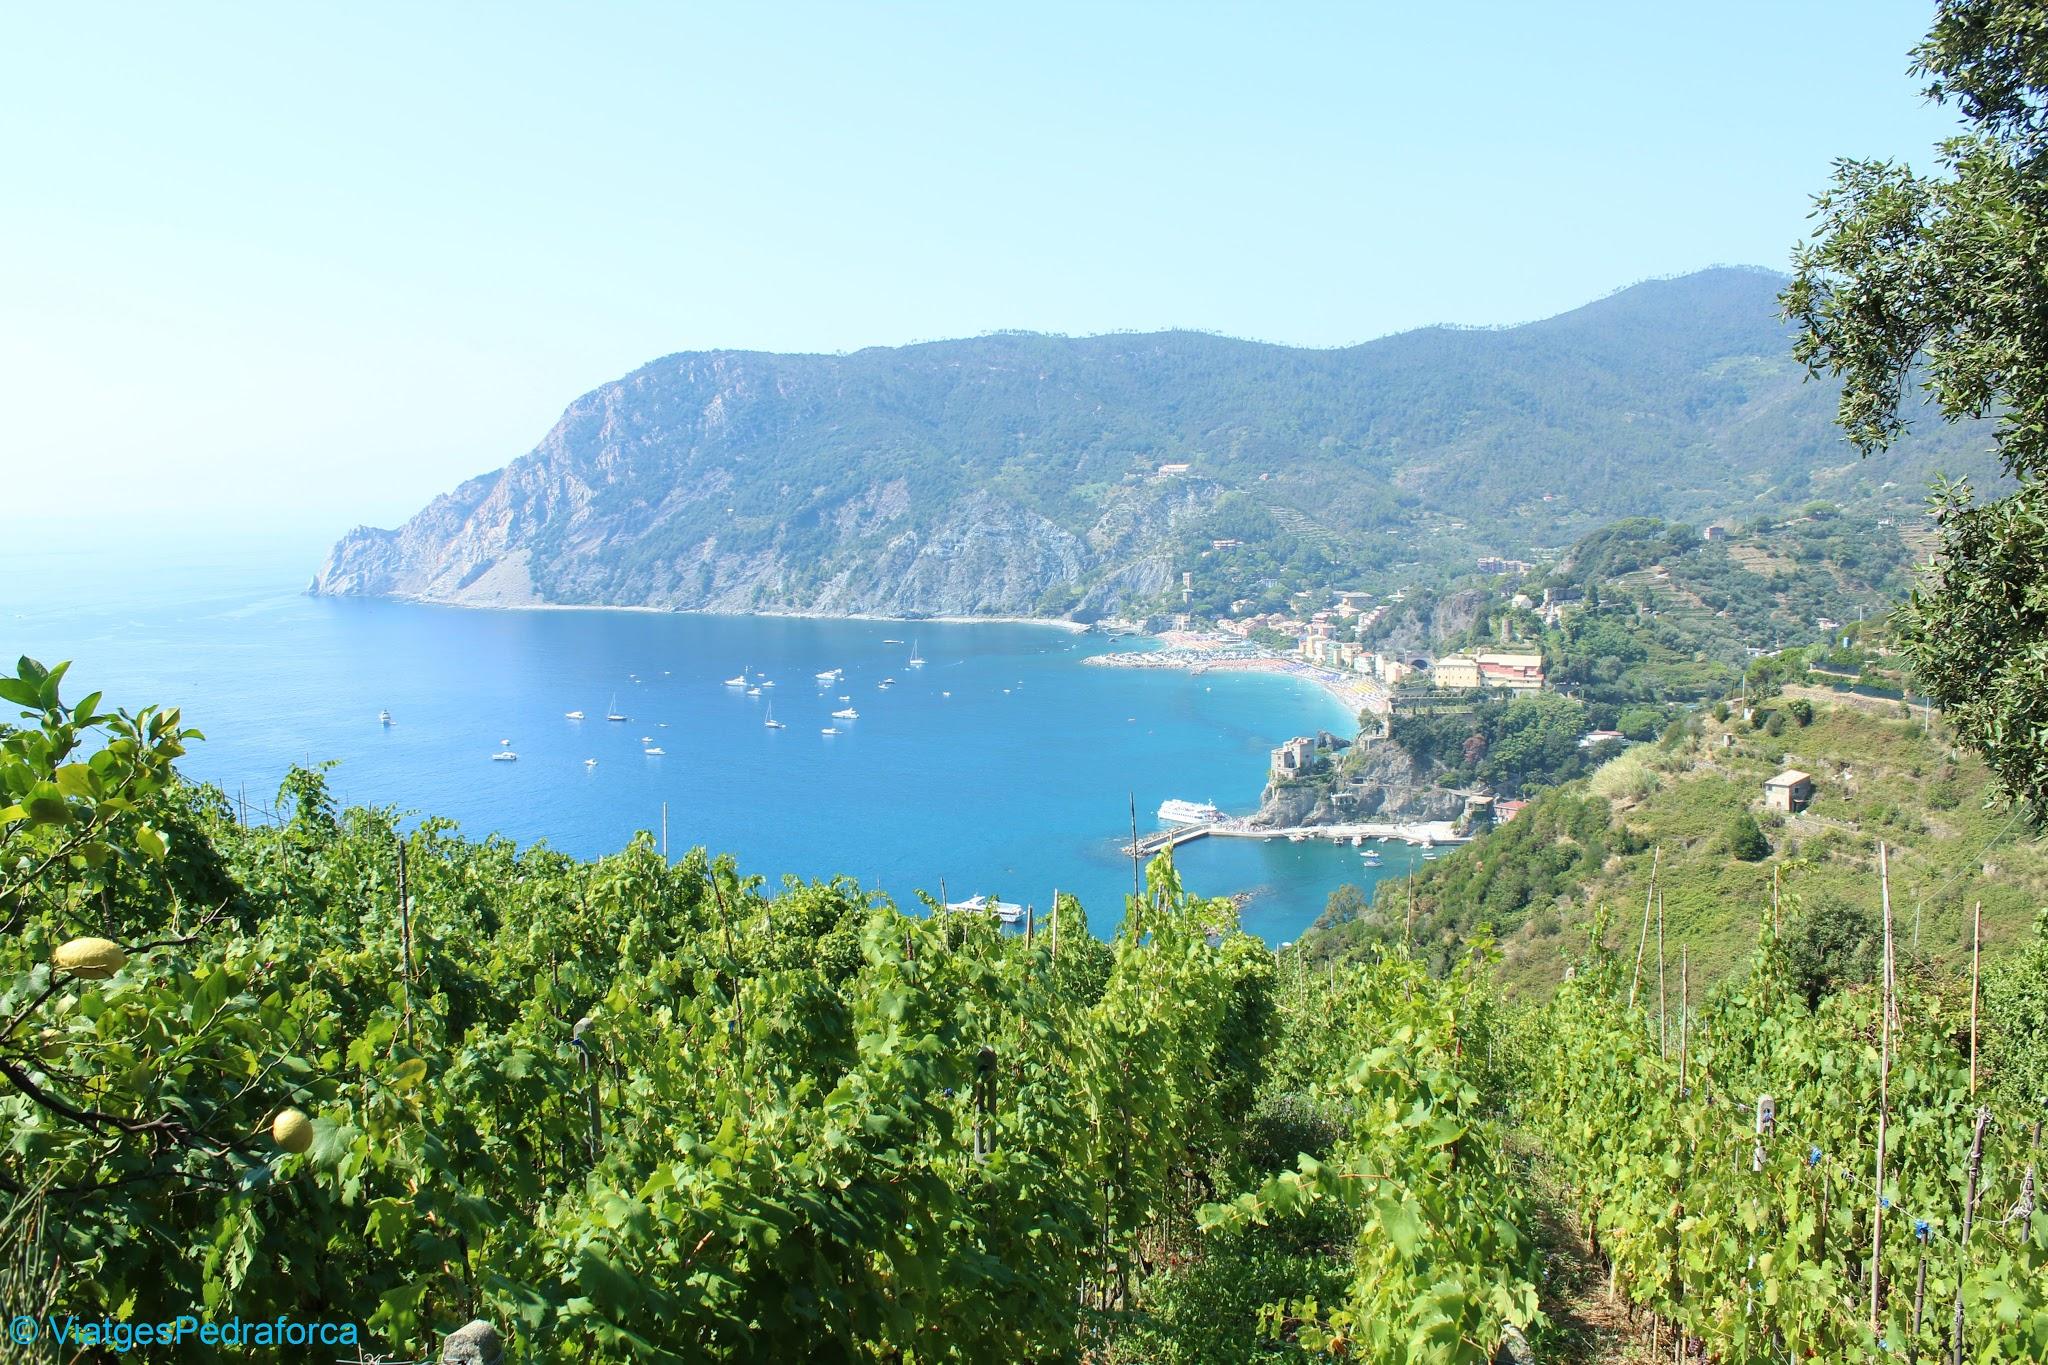 Monterosso, Cinque Terre, Sentiero Azurro, Unesco World Heritage, Patrimoni de la Humanitat, Italia